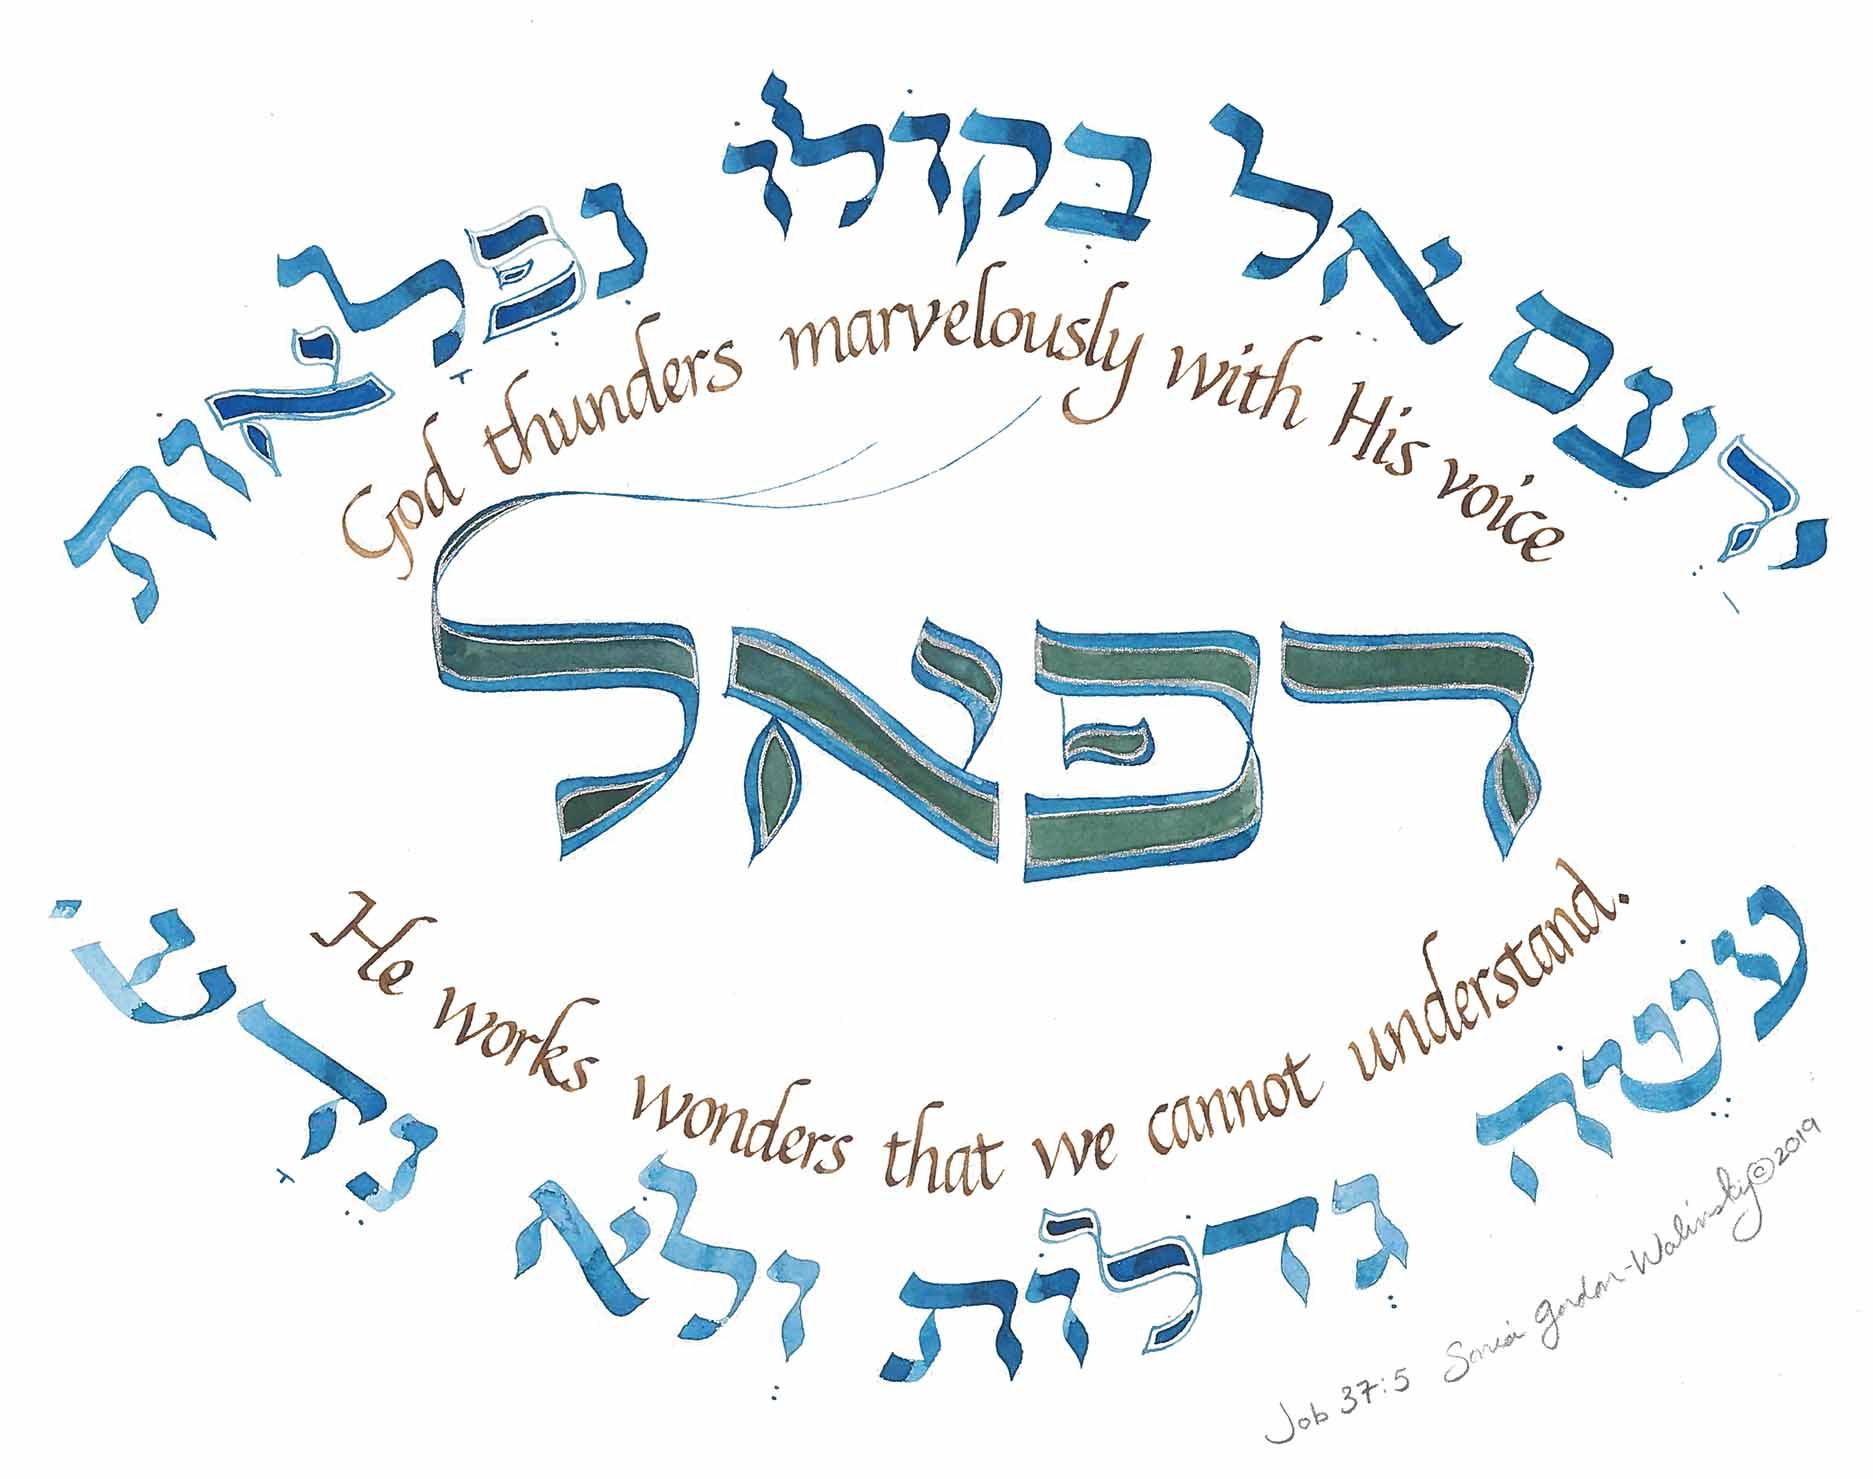 Hebrew_name_pasuk_art_pasukart_by_sonia_gordon_walinsky_soniagordonwalinsky_rafael_job 37:5